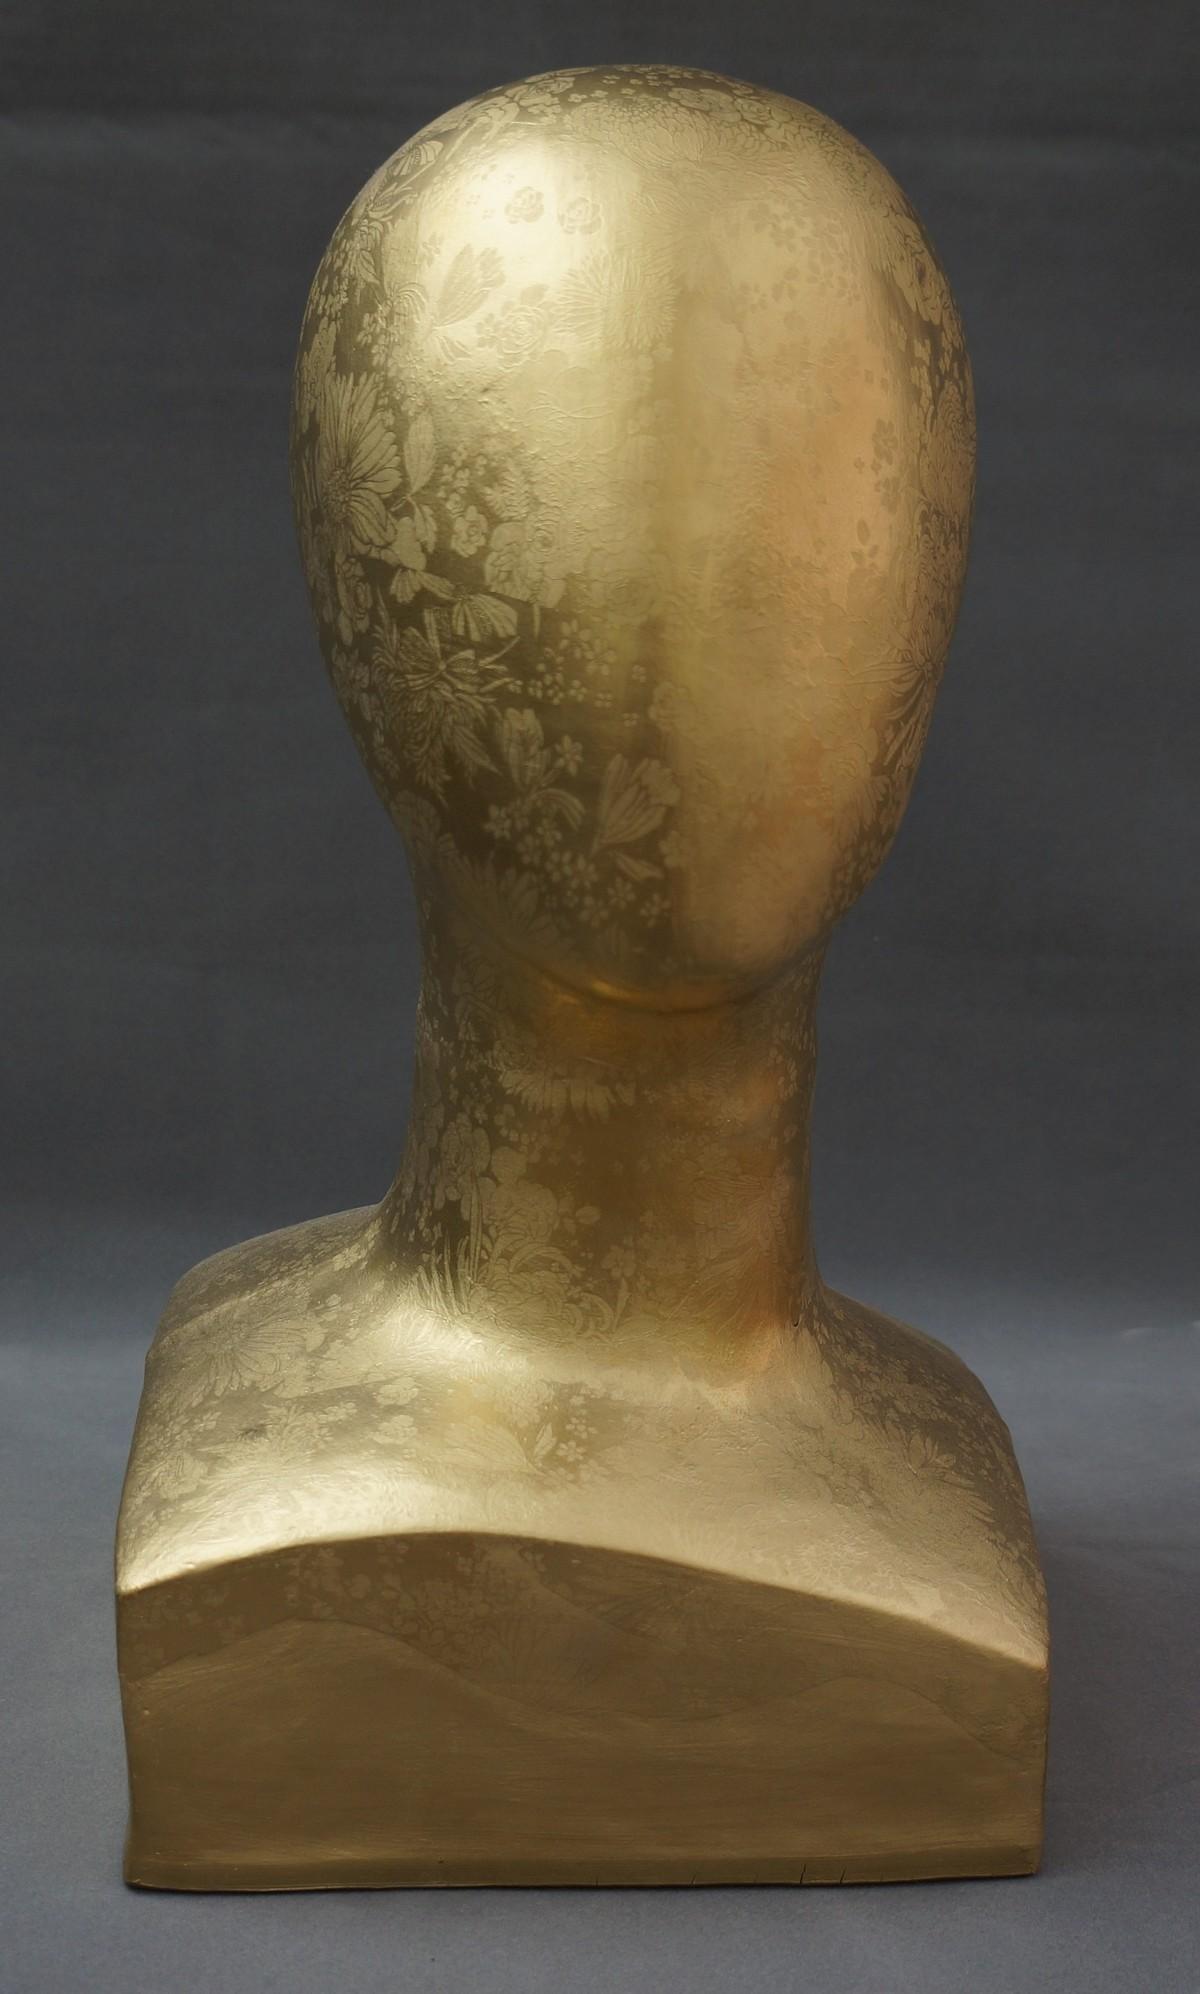 Timeless 1 by Usha Garodia, Art Deco Sculpture | 3D, Ceramic, Beige color